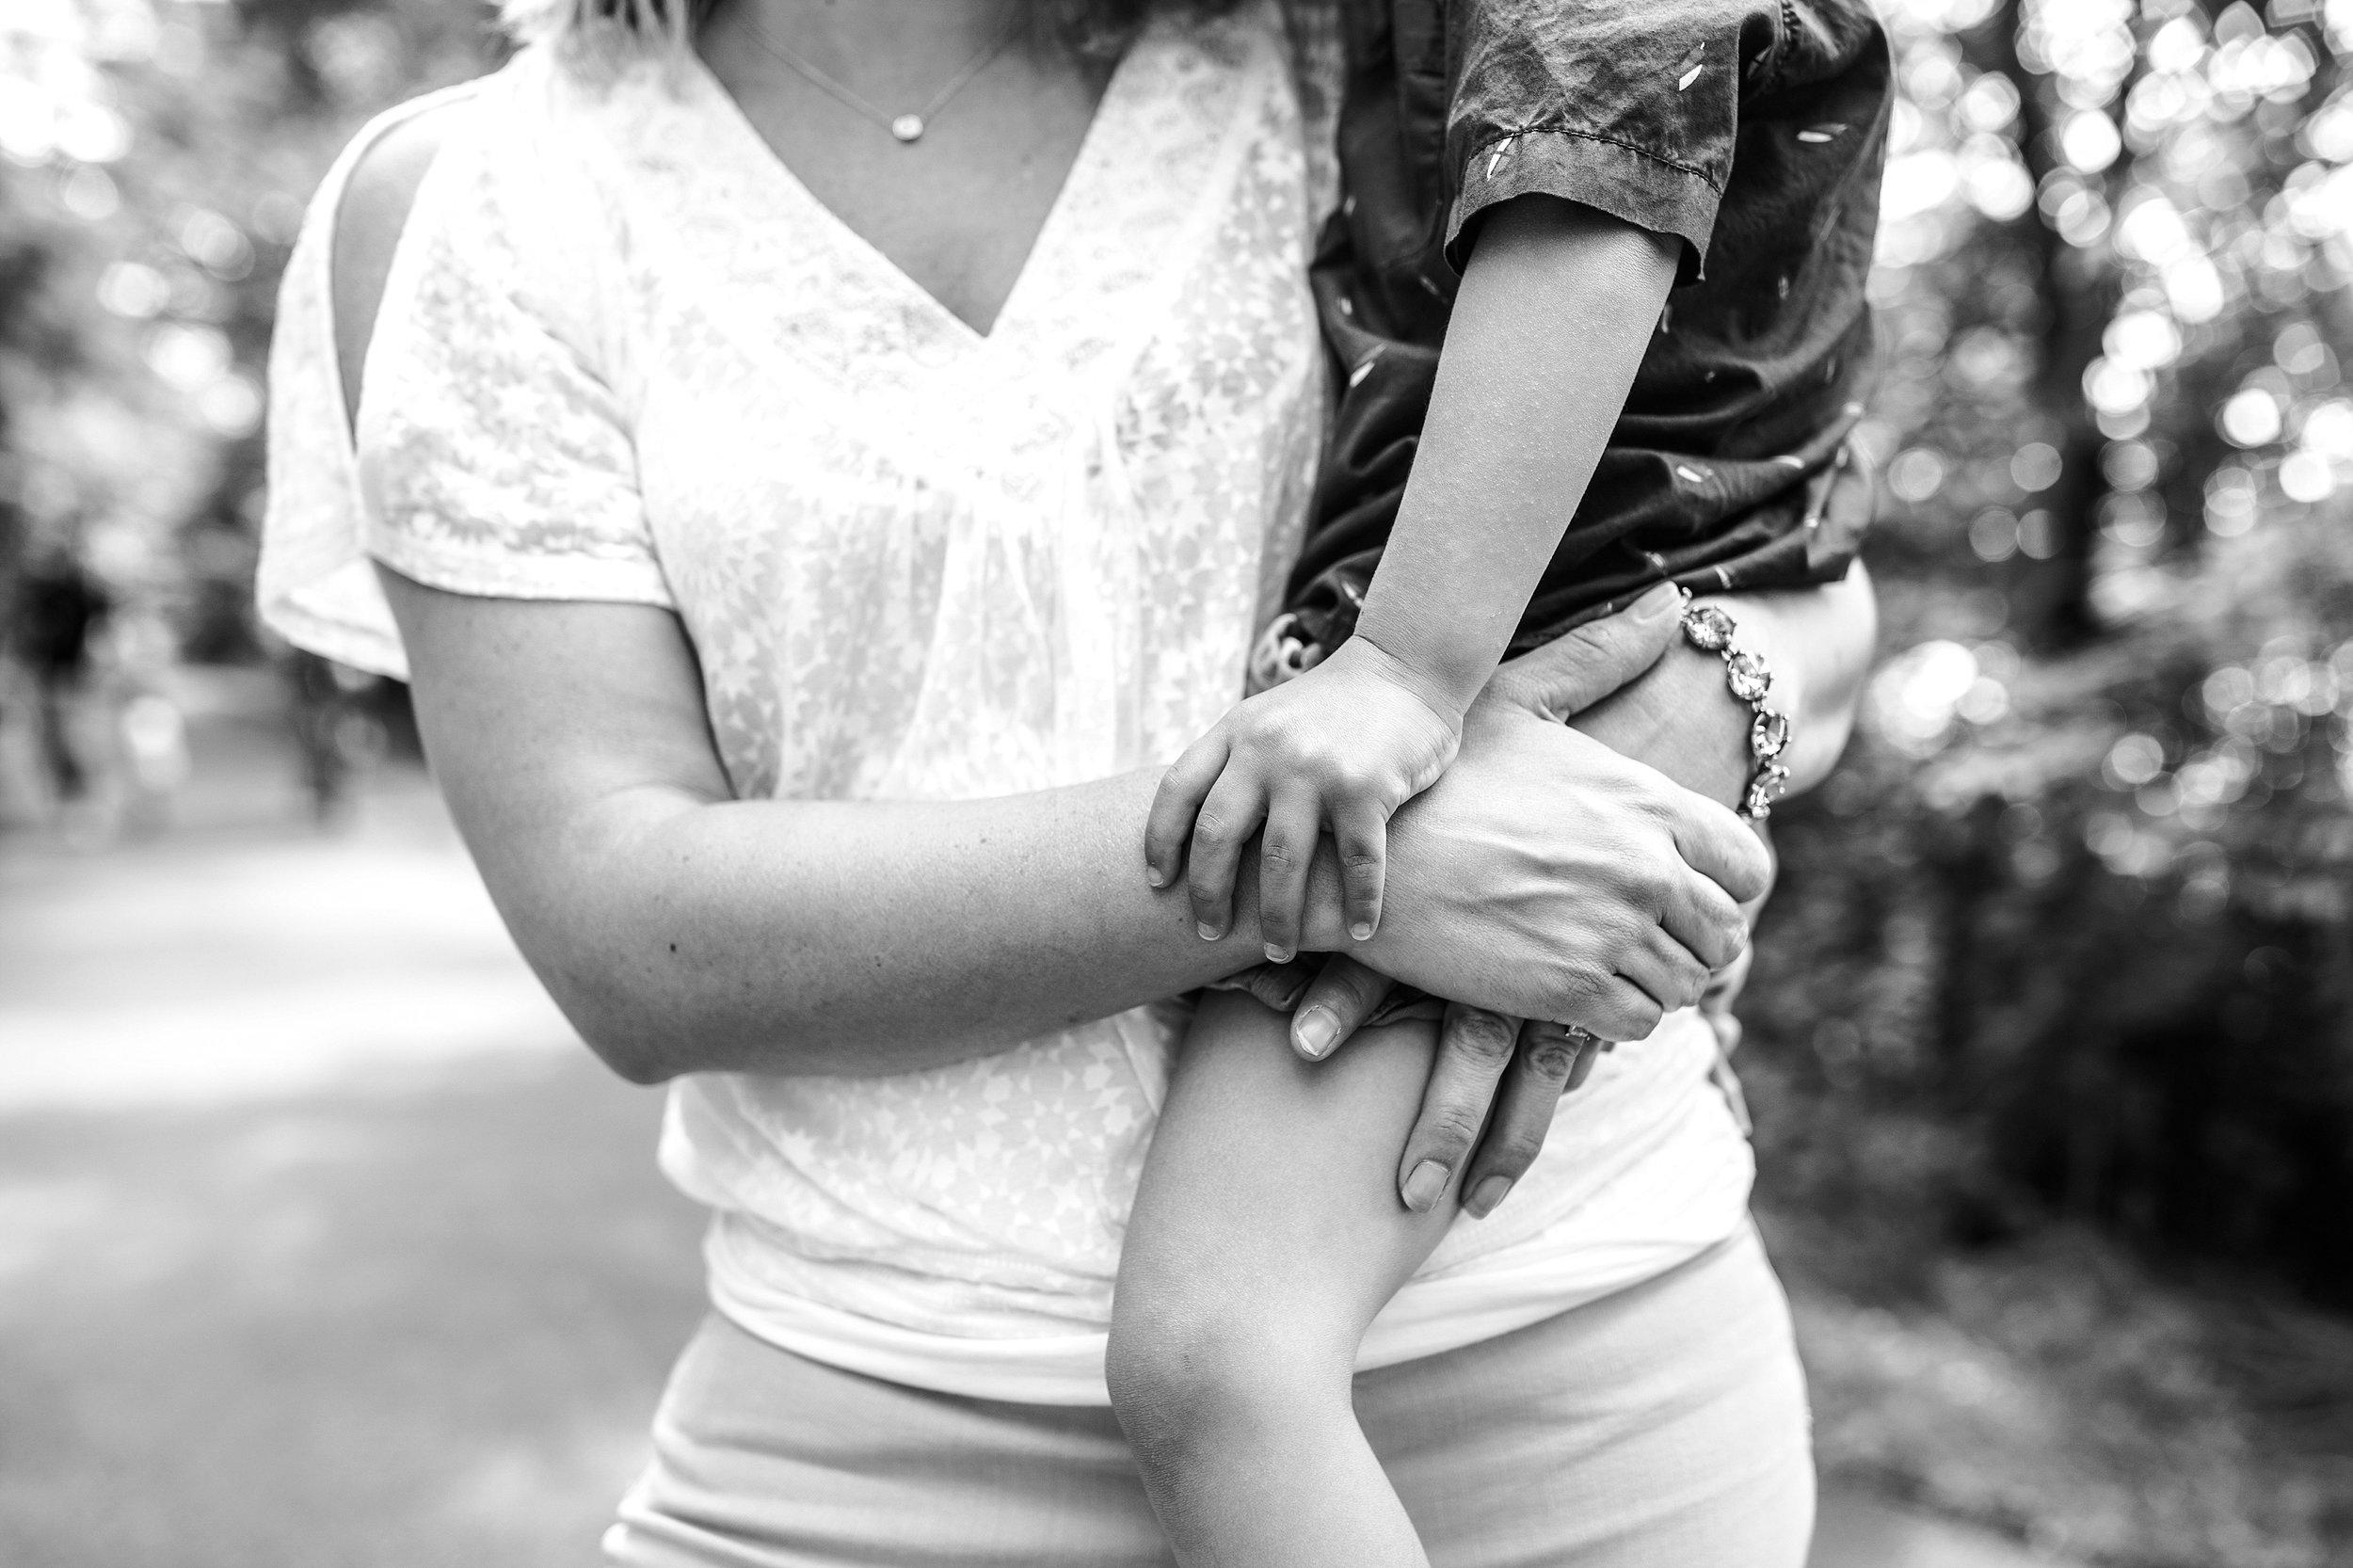 Bucks-County-Family-Photographer_0014-1.jpg